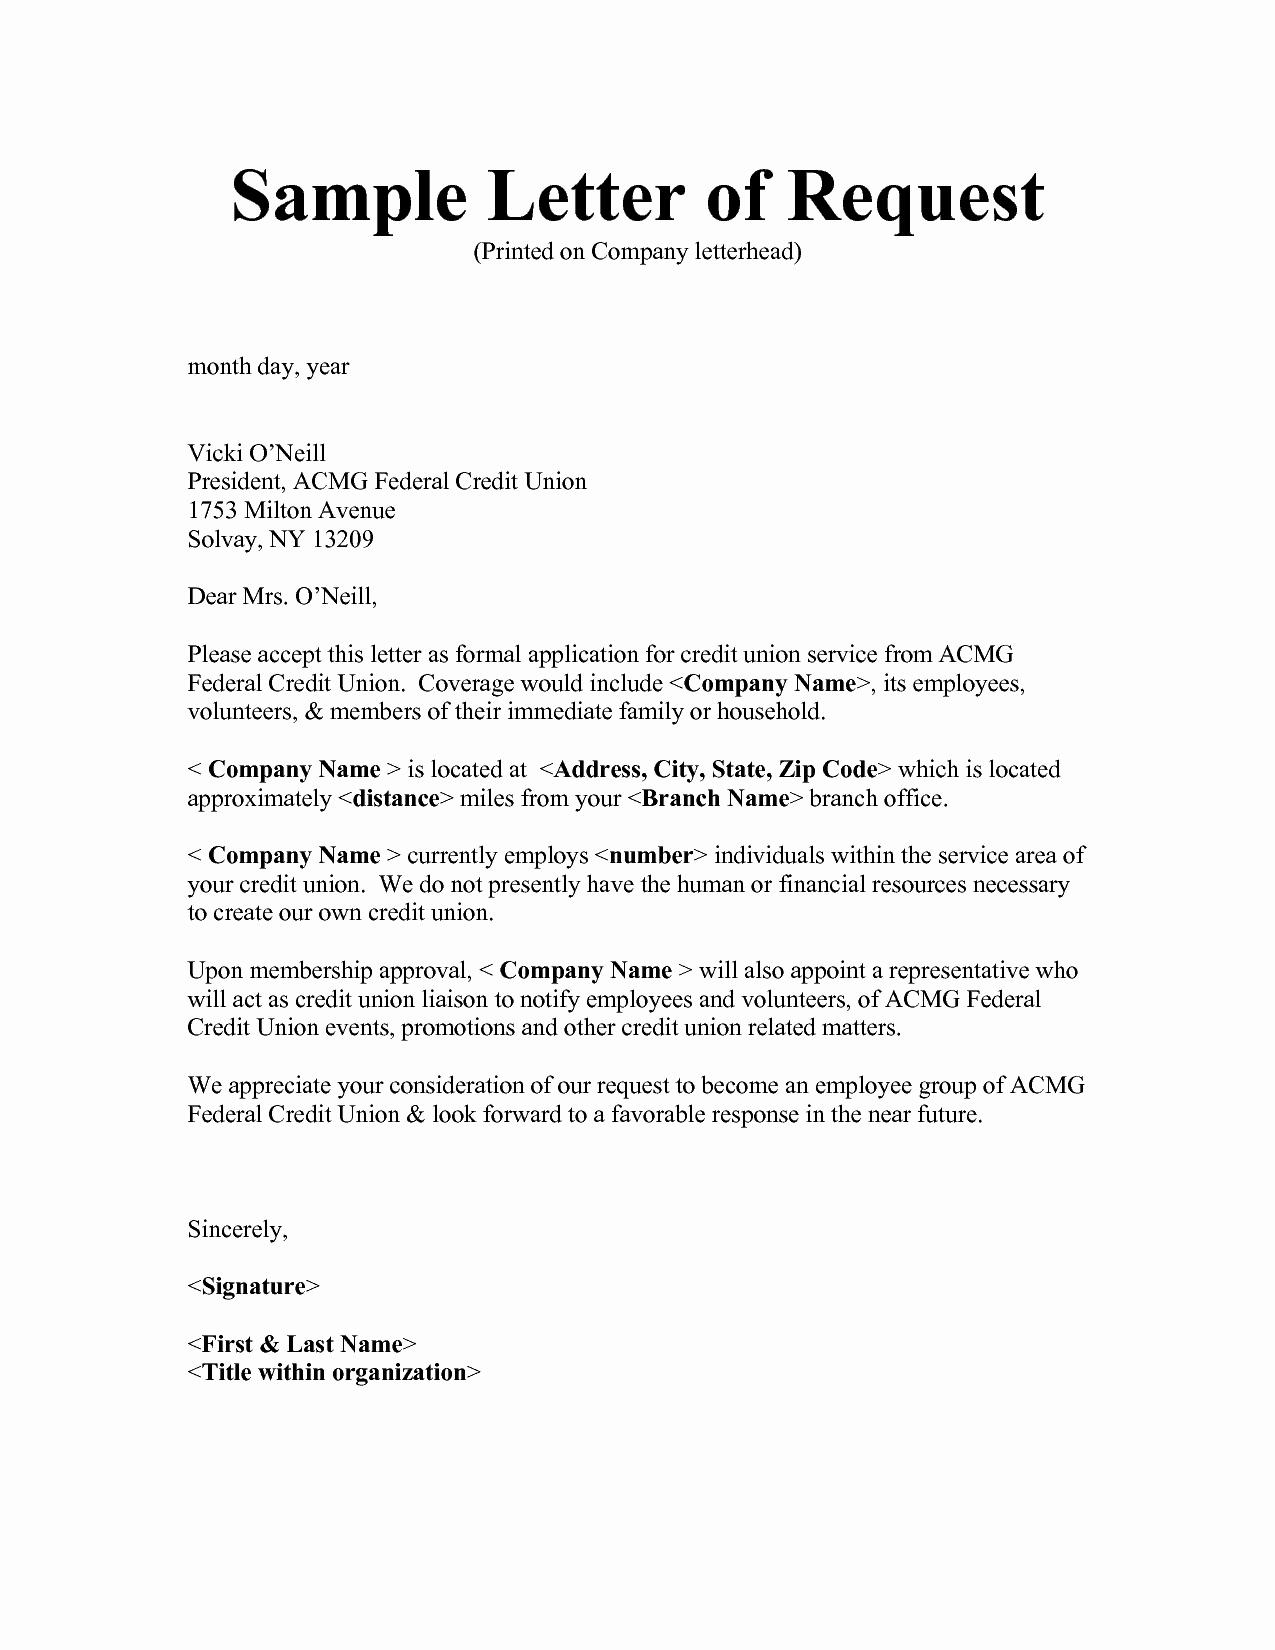 Formal Letter format Sample Lovely Business Letter Requesting Information Sample Letters